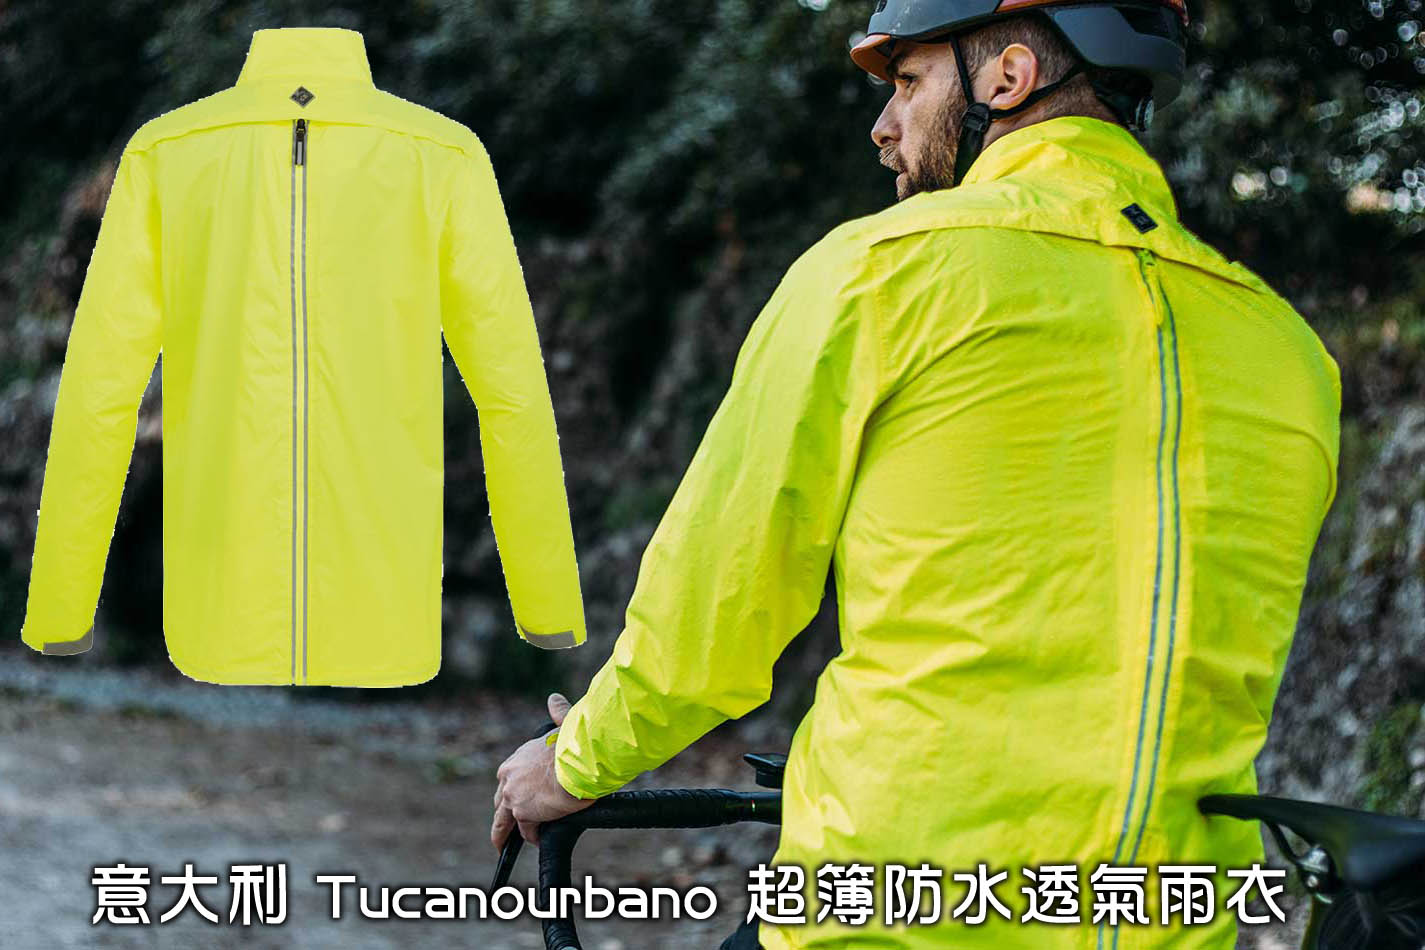 2020 Tucanourbano Jacket Nano Rain Zeta